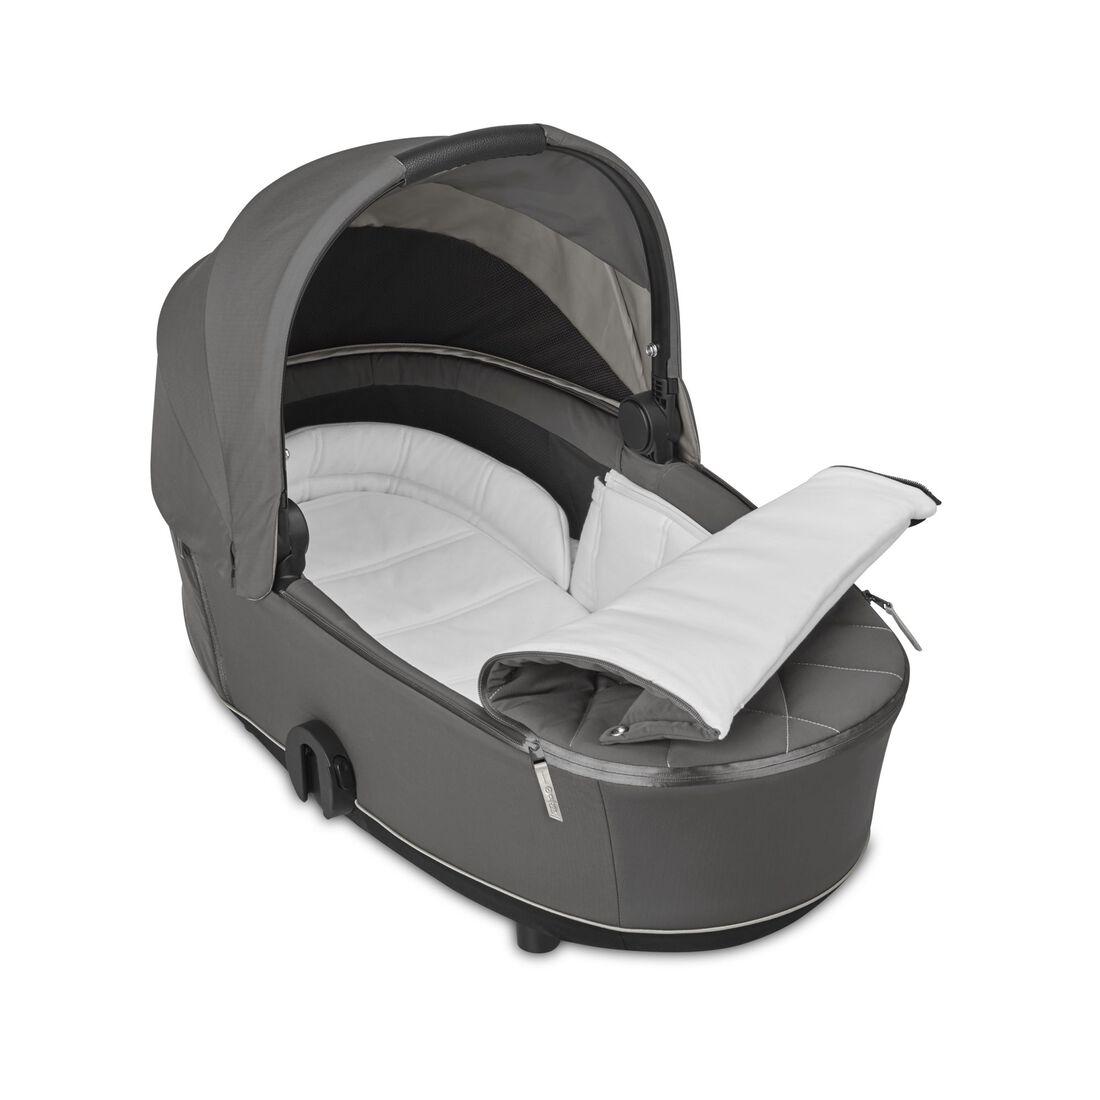 CYBEX Mios Lux Carry Cot - Soho Grey in Soho Grey large Bild 2